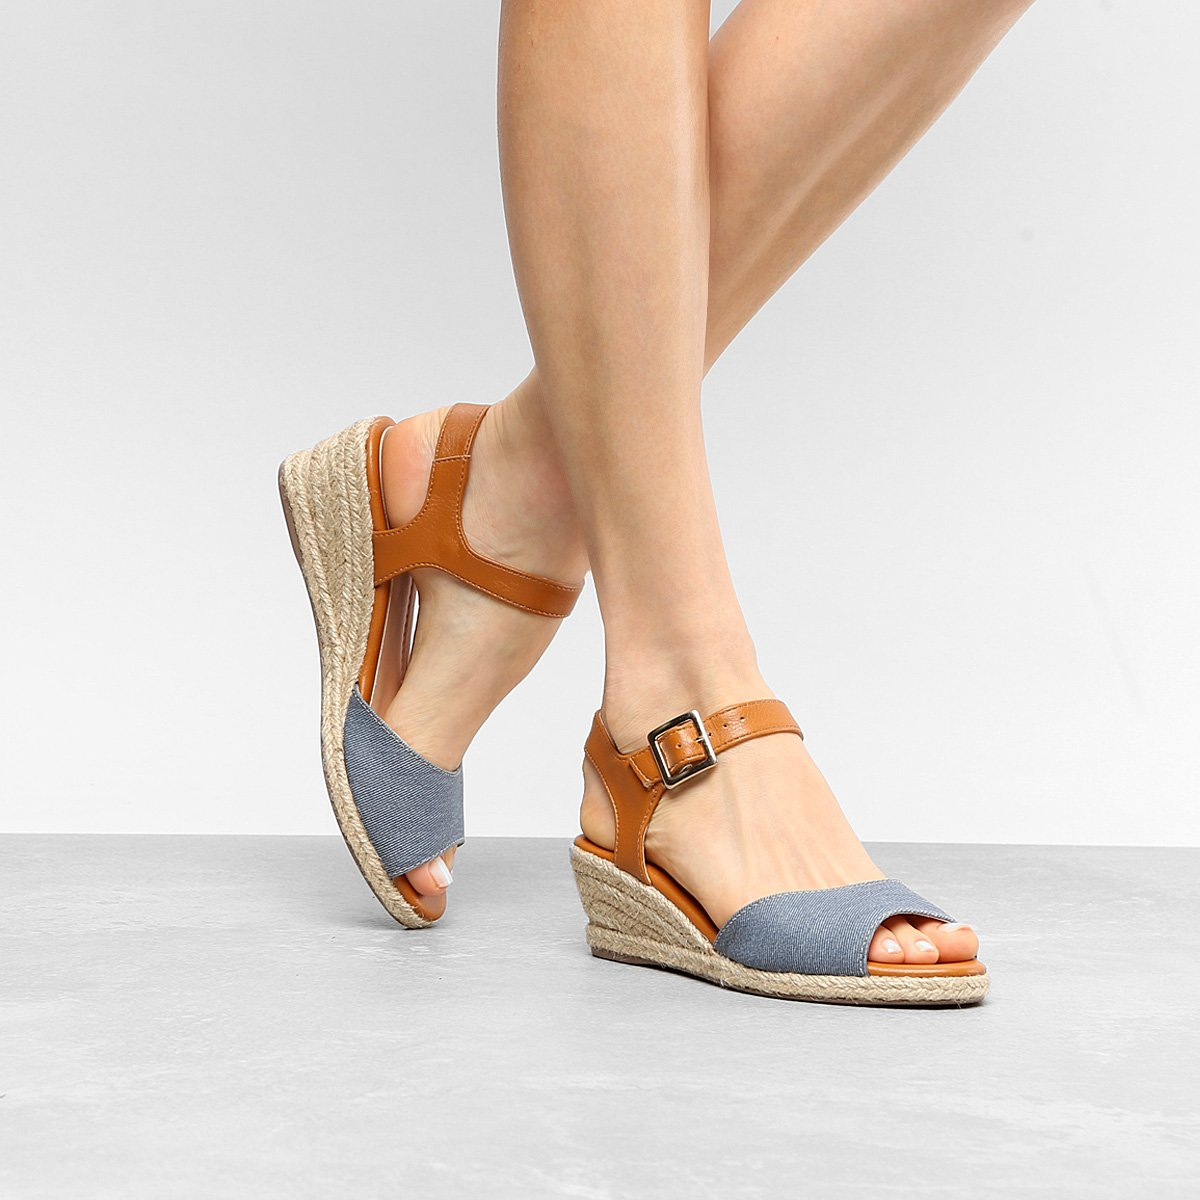 83b49ee211 Sandália Anabela Shoestock Salto Baixo Espadrille Feminina - Compre Agora